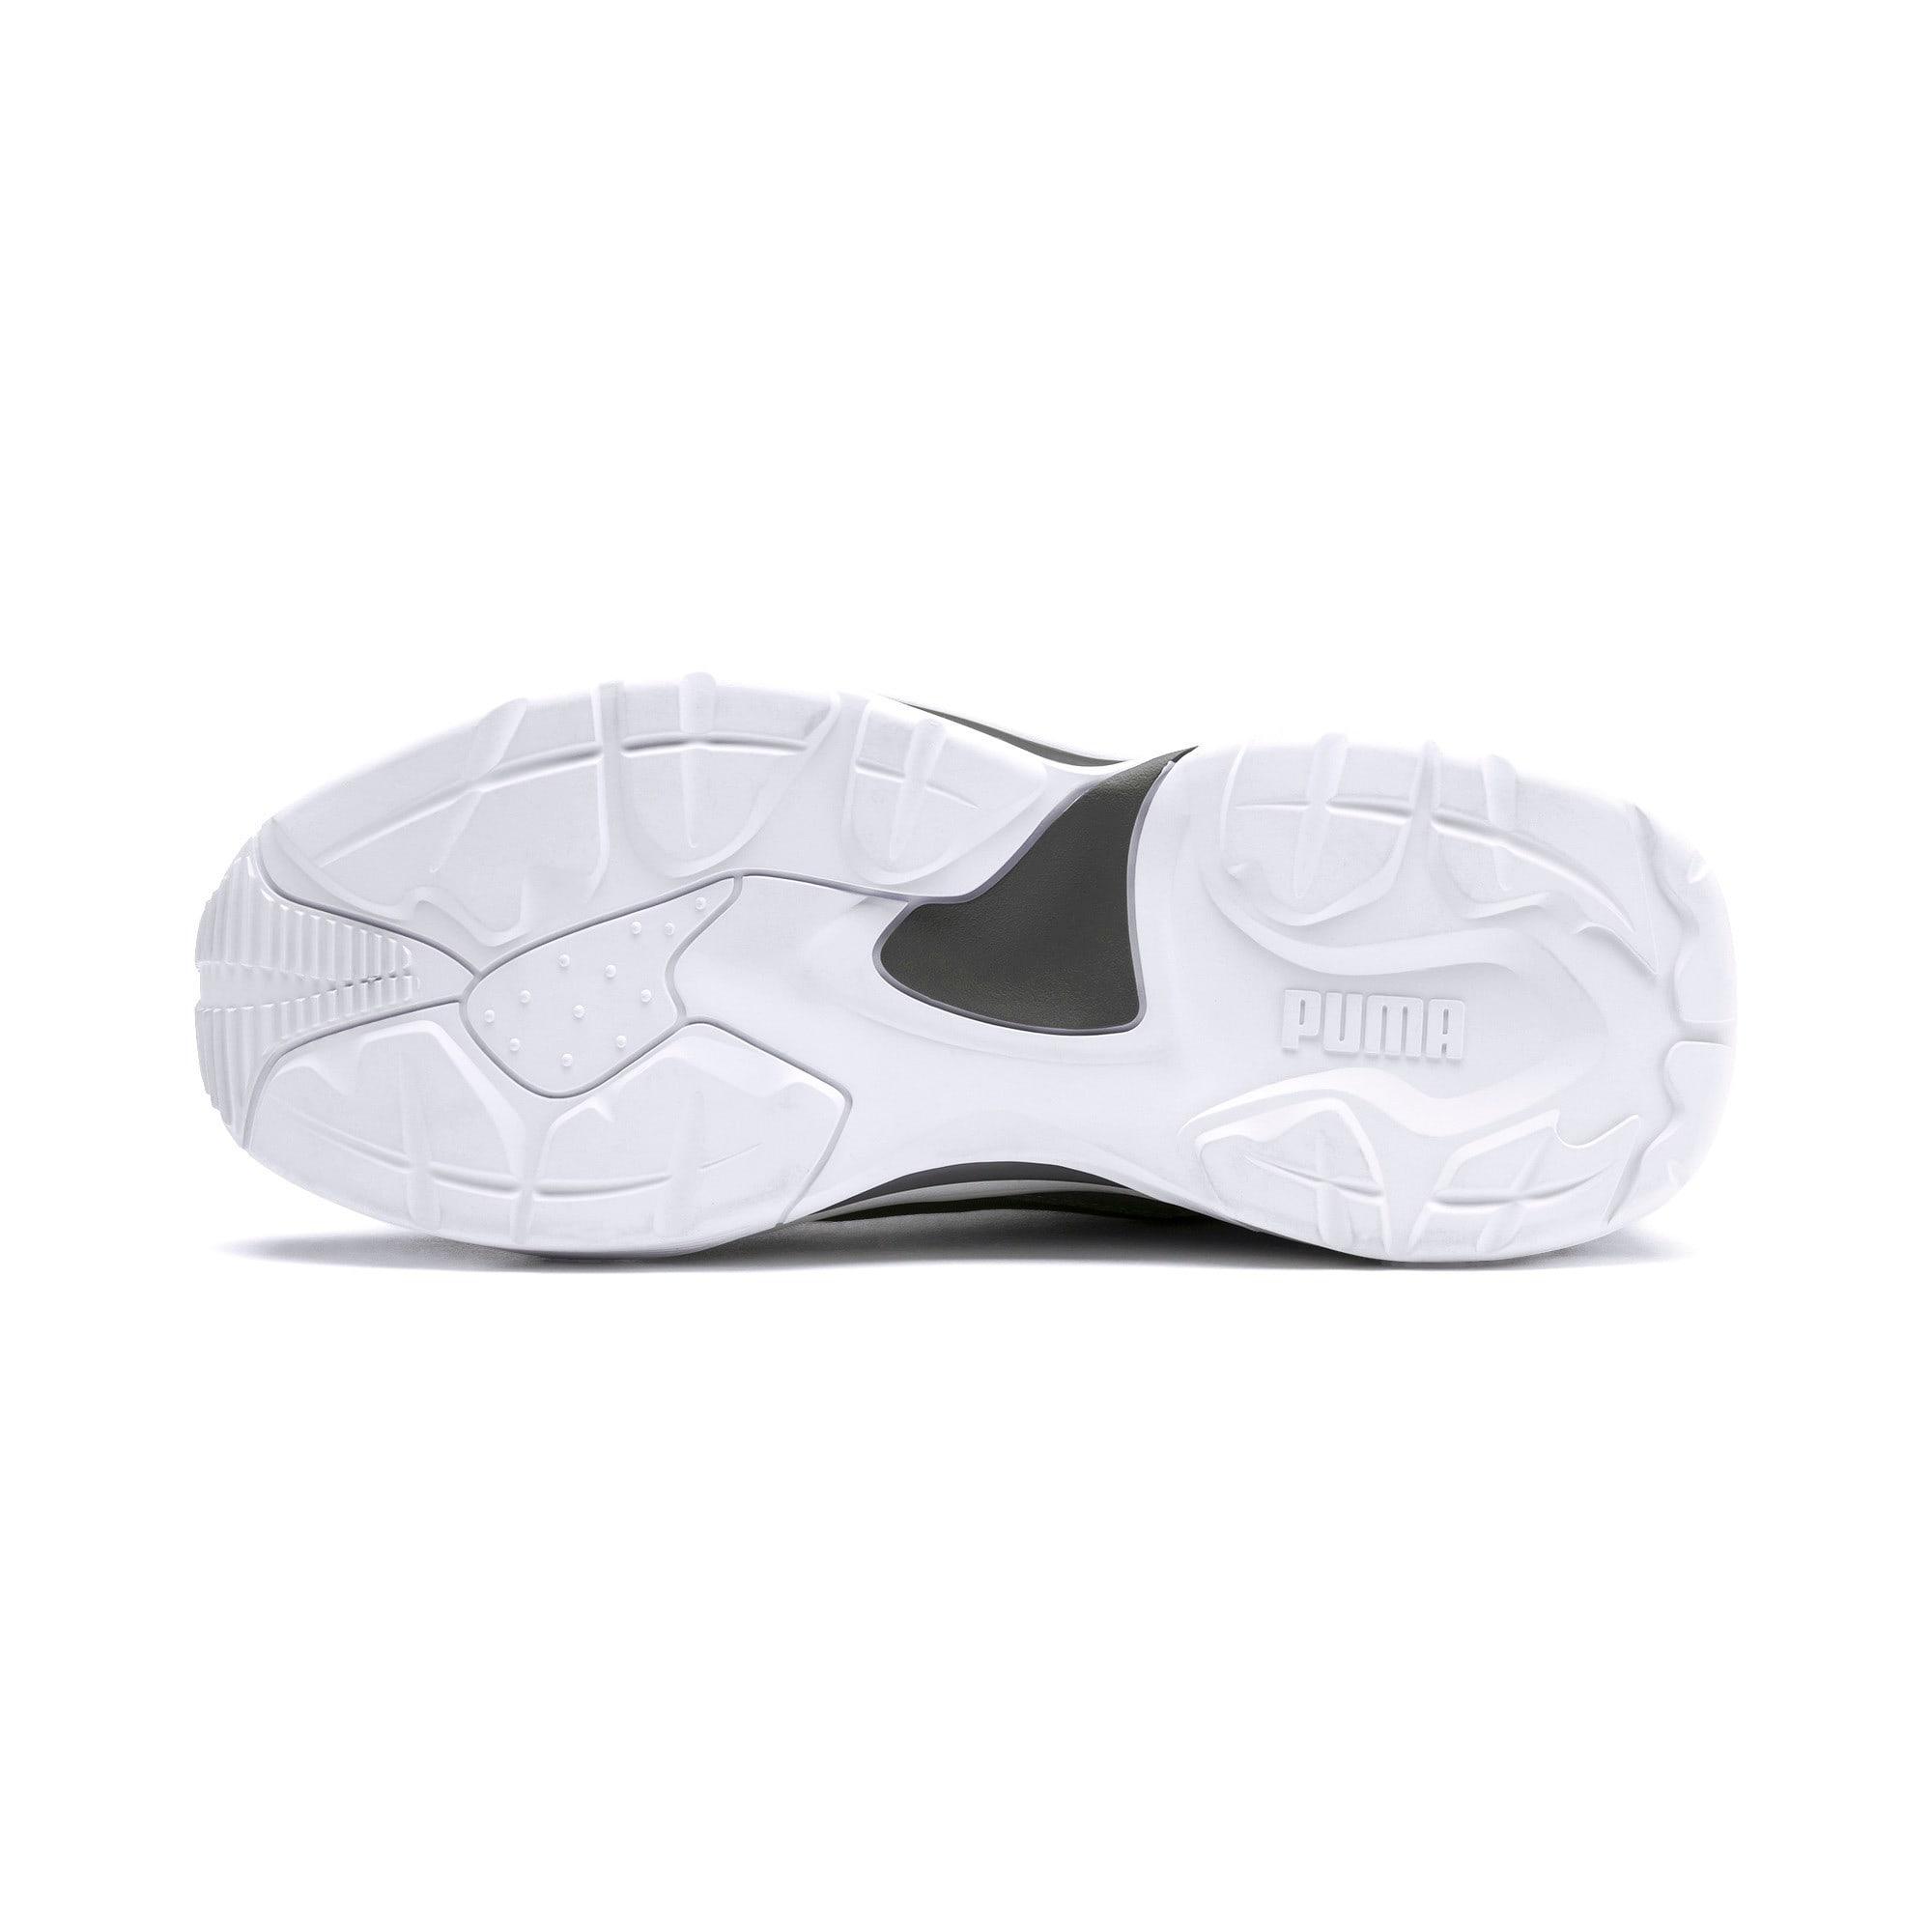 Thumbnail 5 of Thunder Fashion 2.0 Sneakers, High Rise-CASTLEROCK, medium